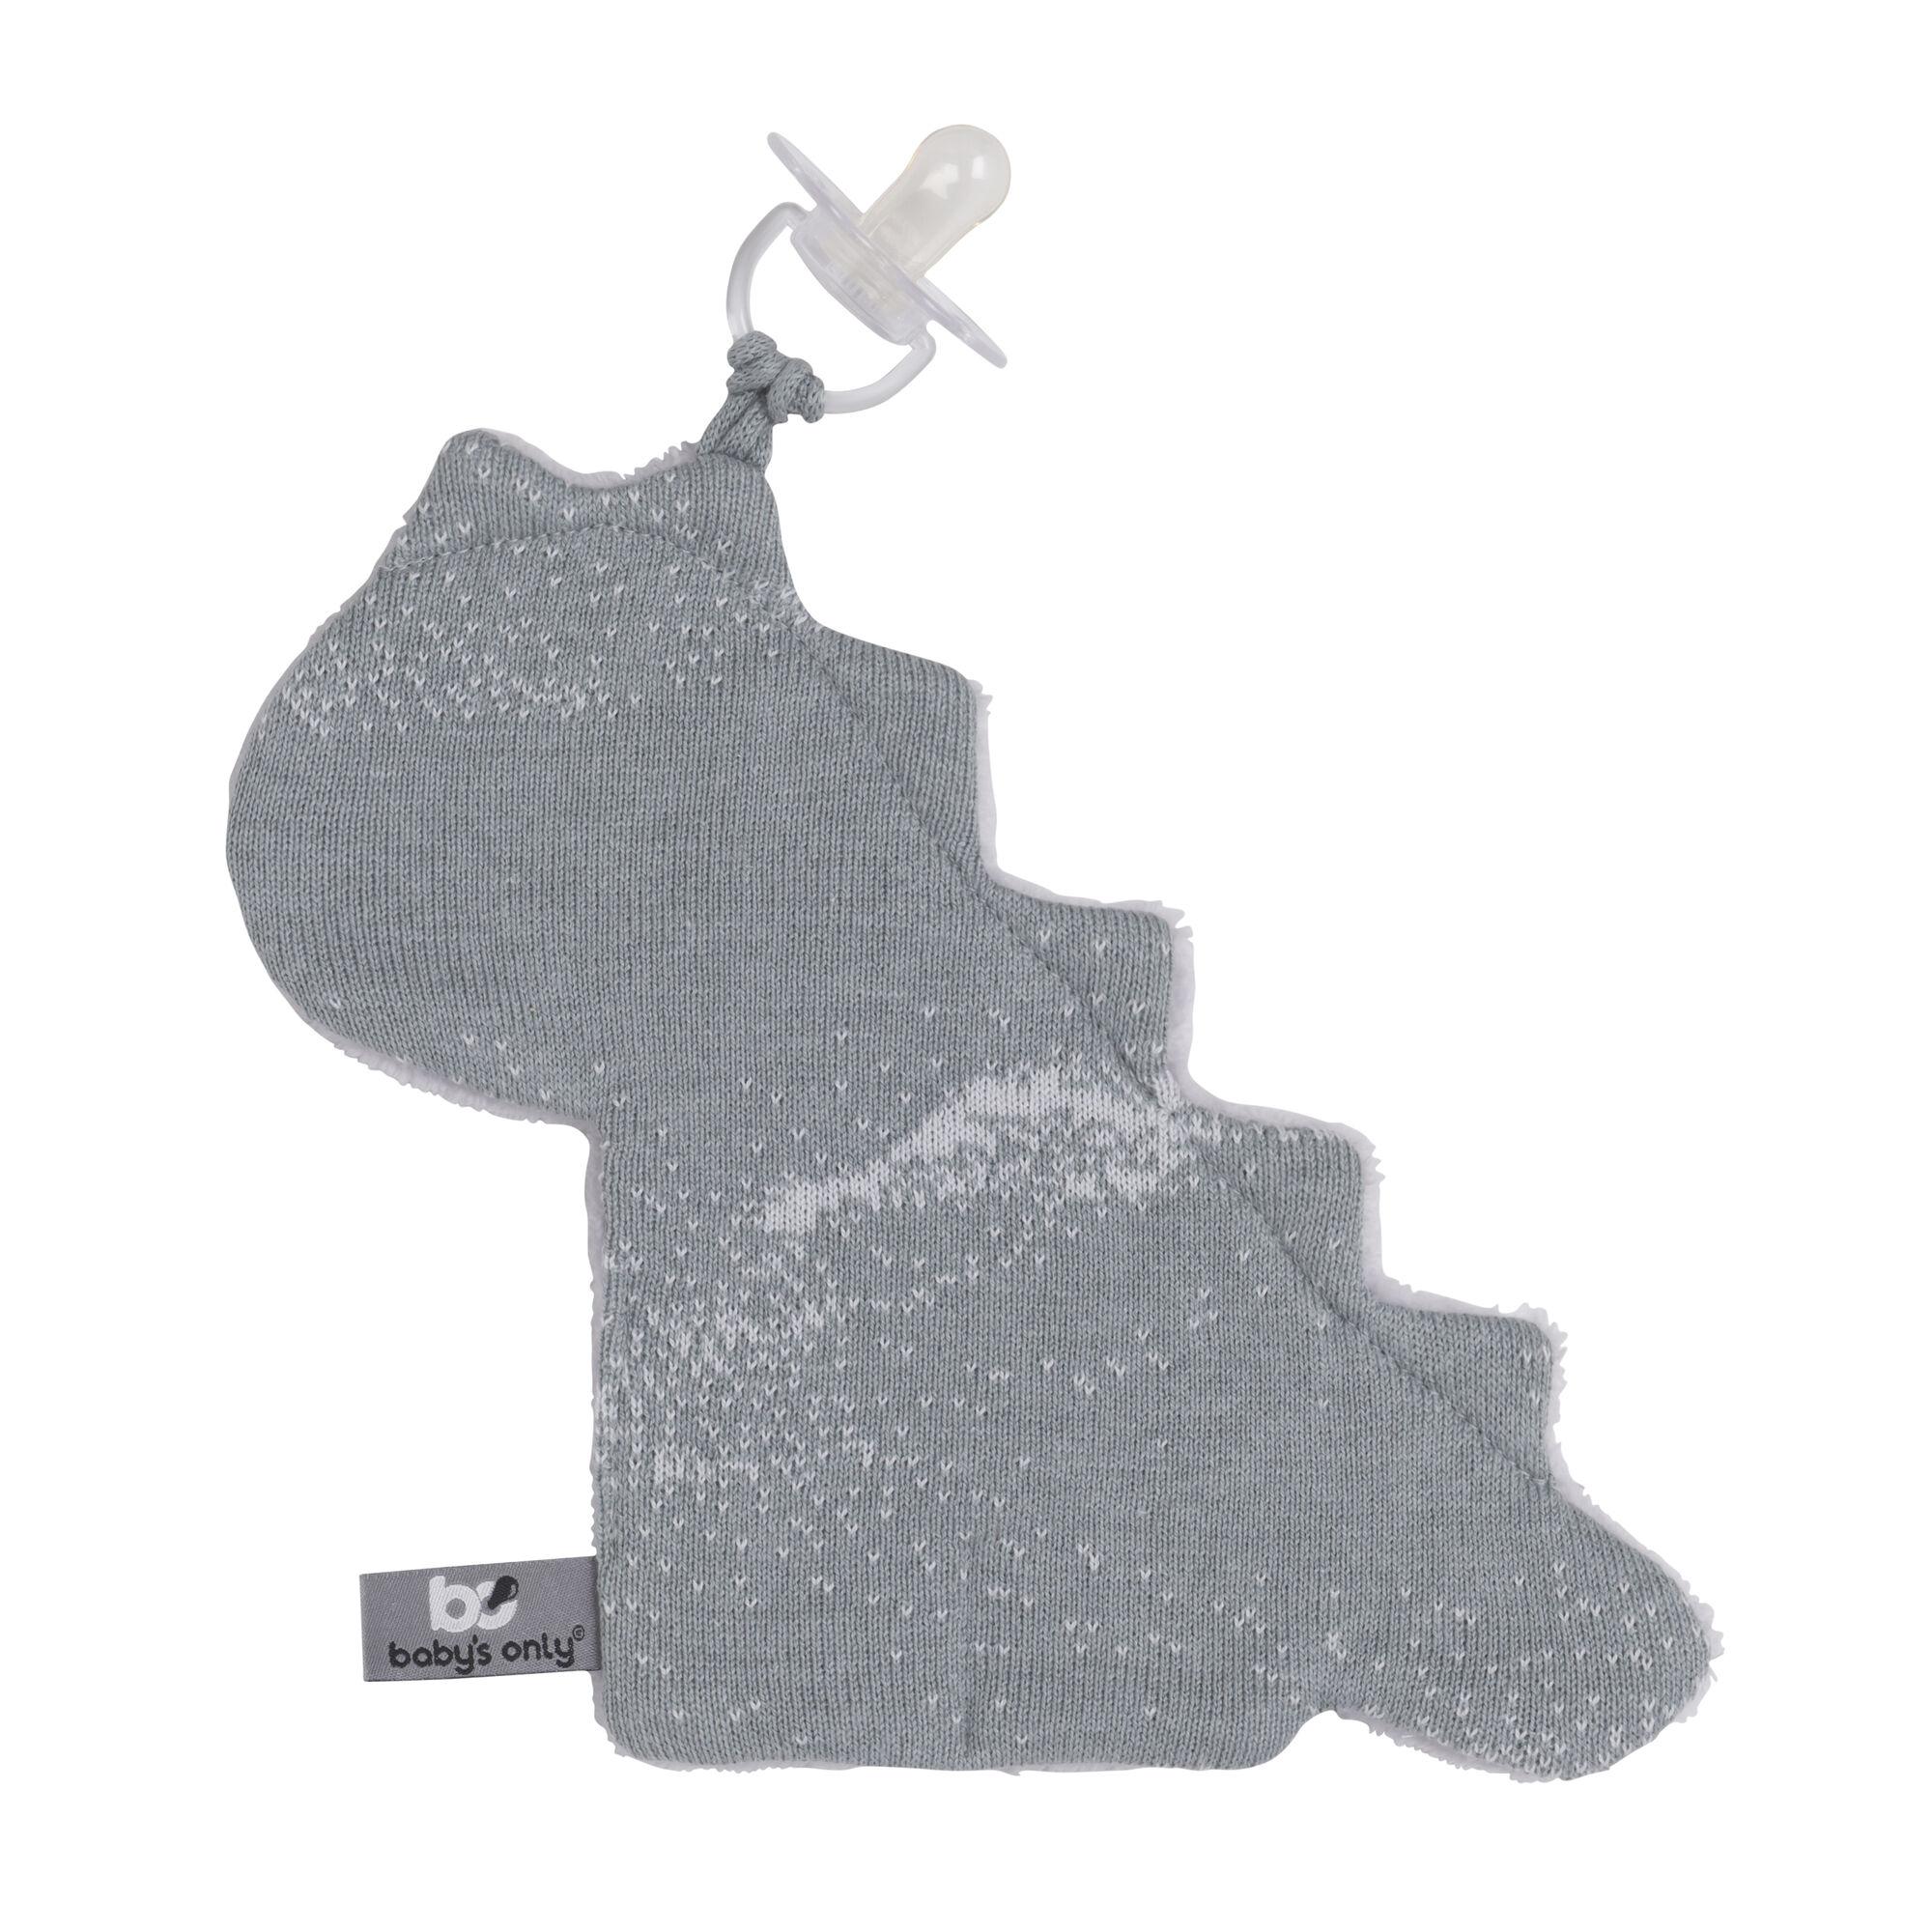 Baby's Only Speendoekje Dino Marble - Silver Grey